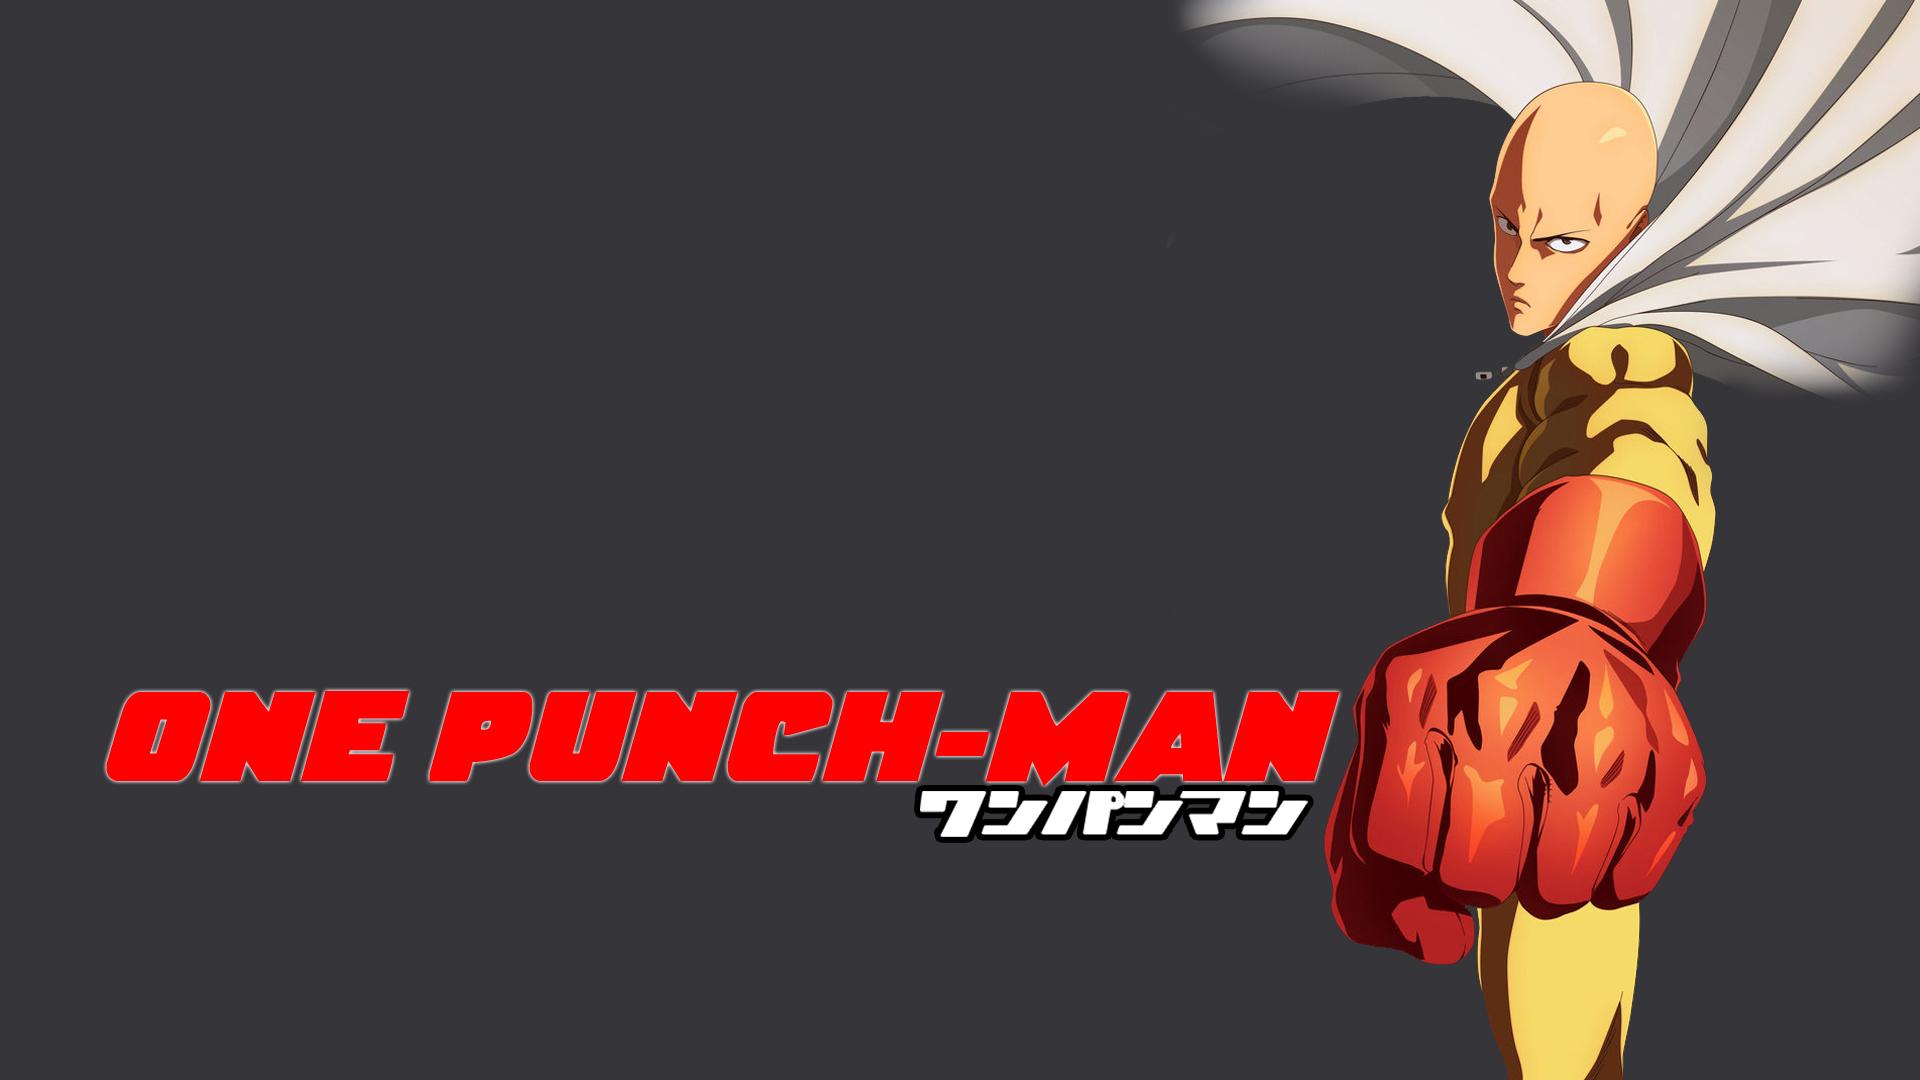 47 One Punch Man Desktop Wallpaper On Wallpapersafari